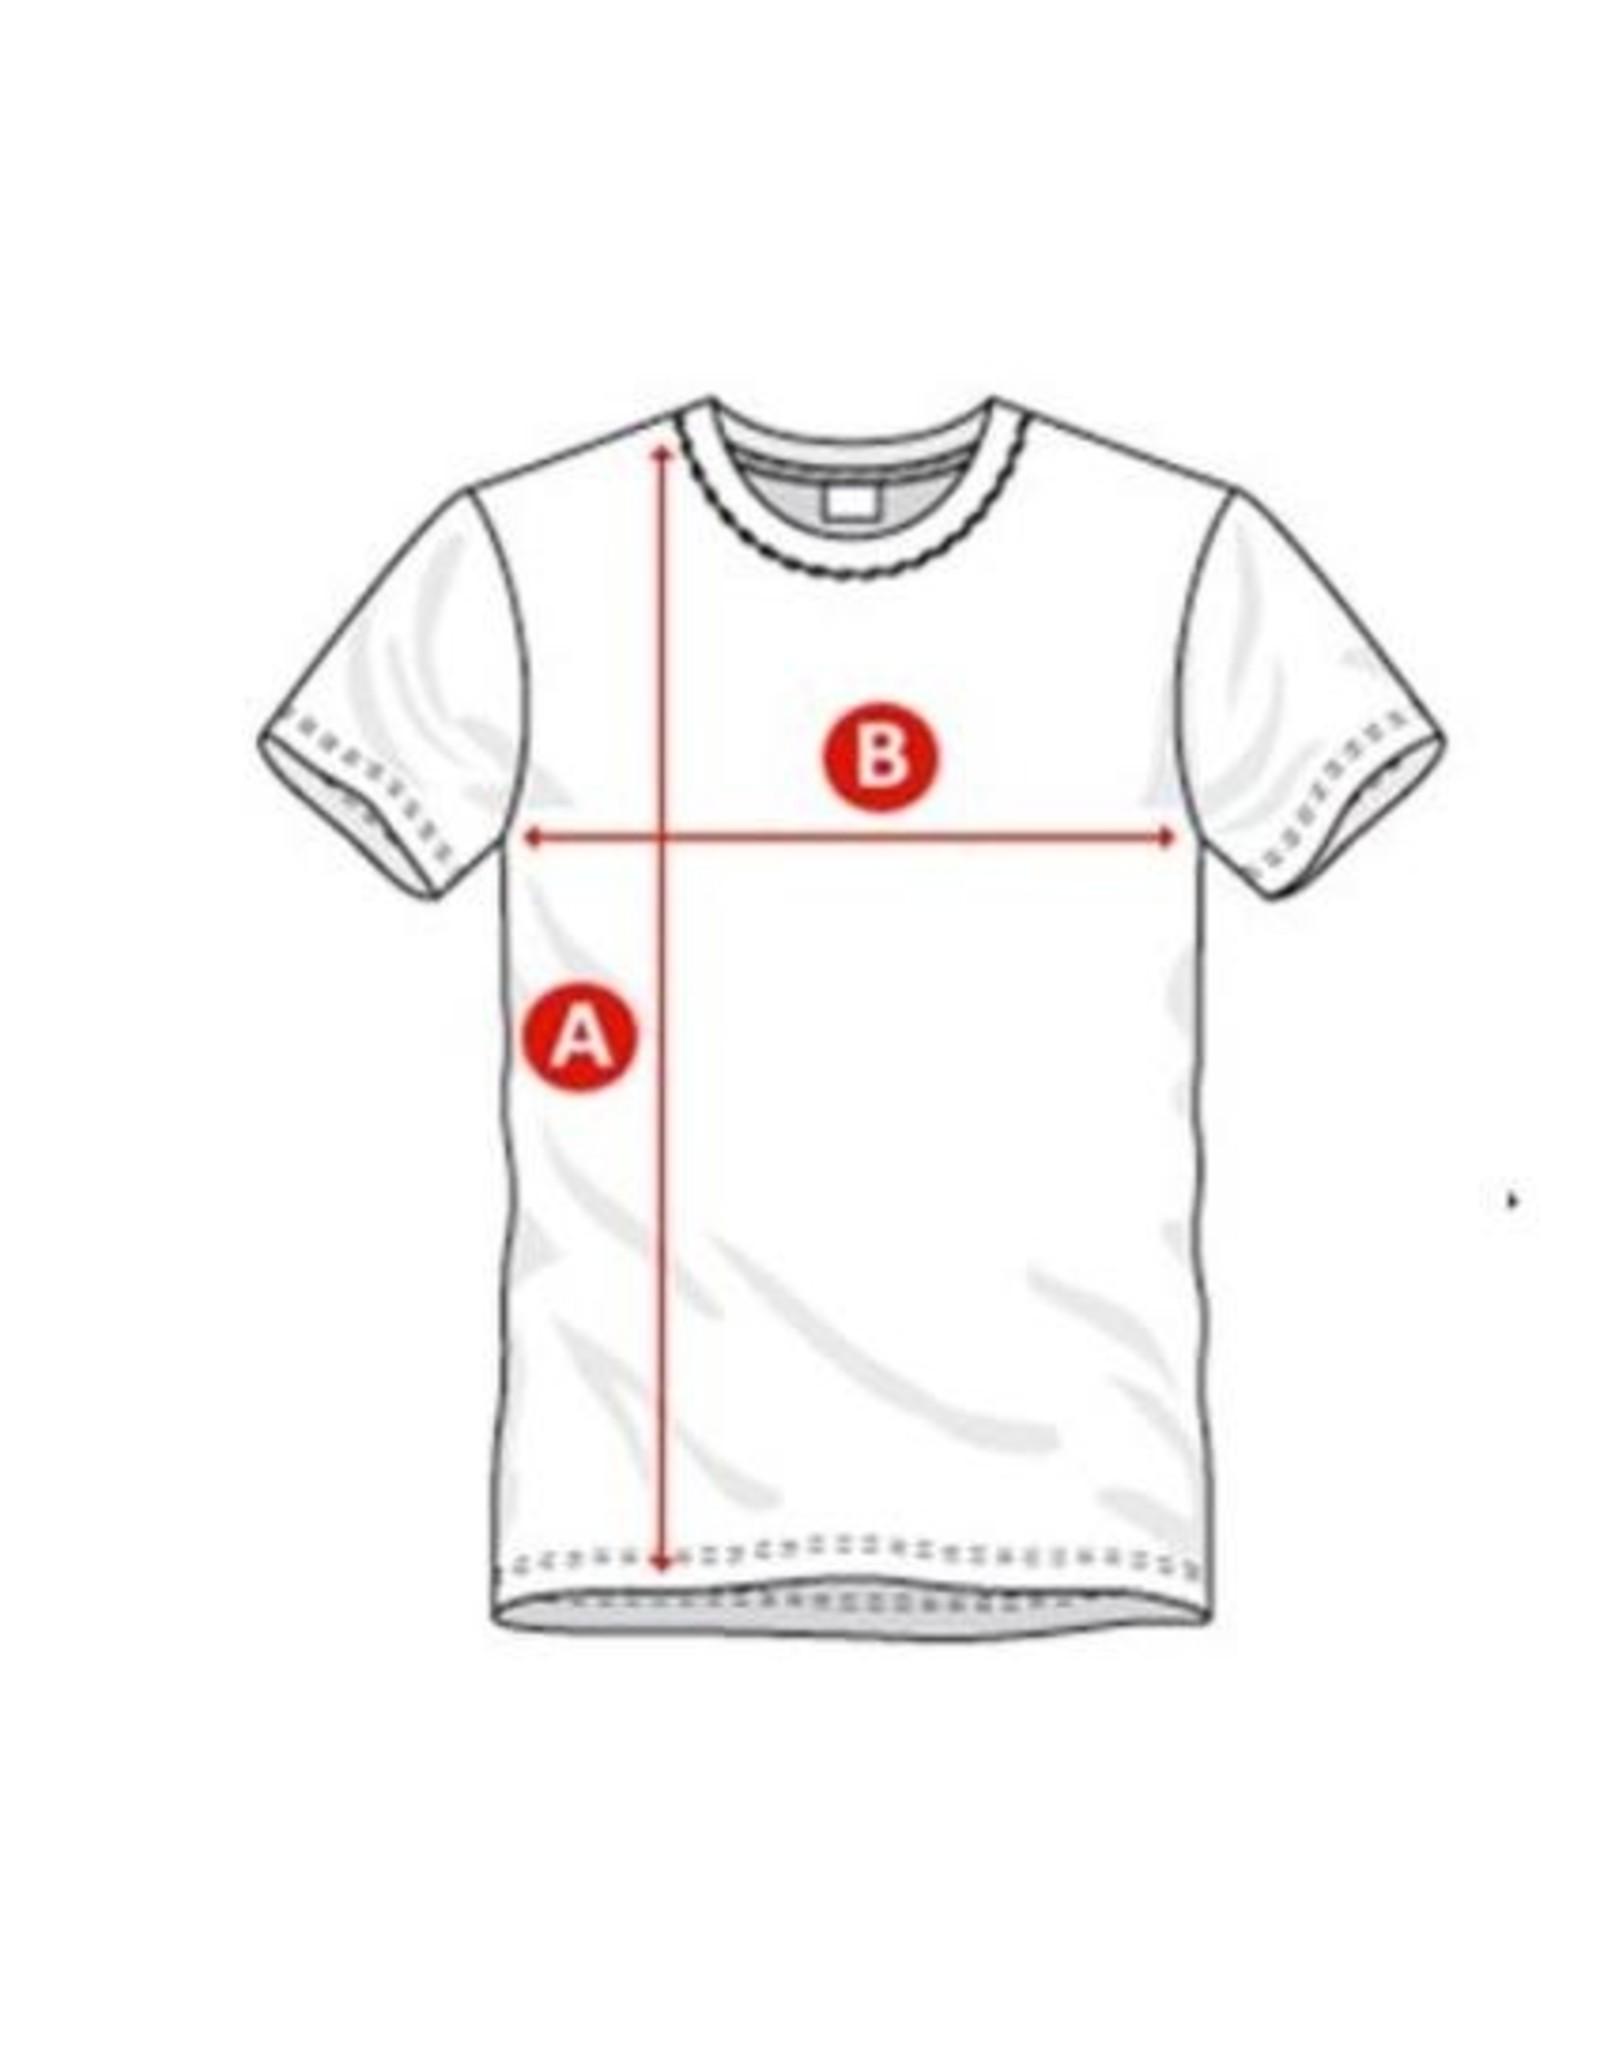 Tamelo T-shirt unisexe Toujours vivant